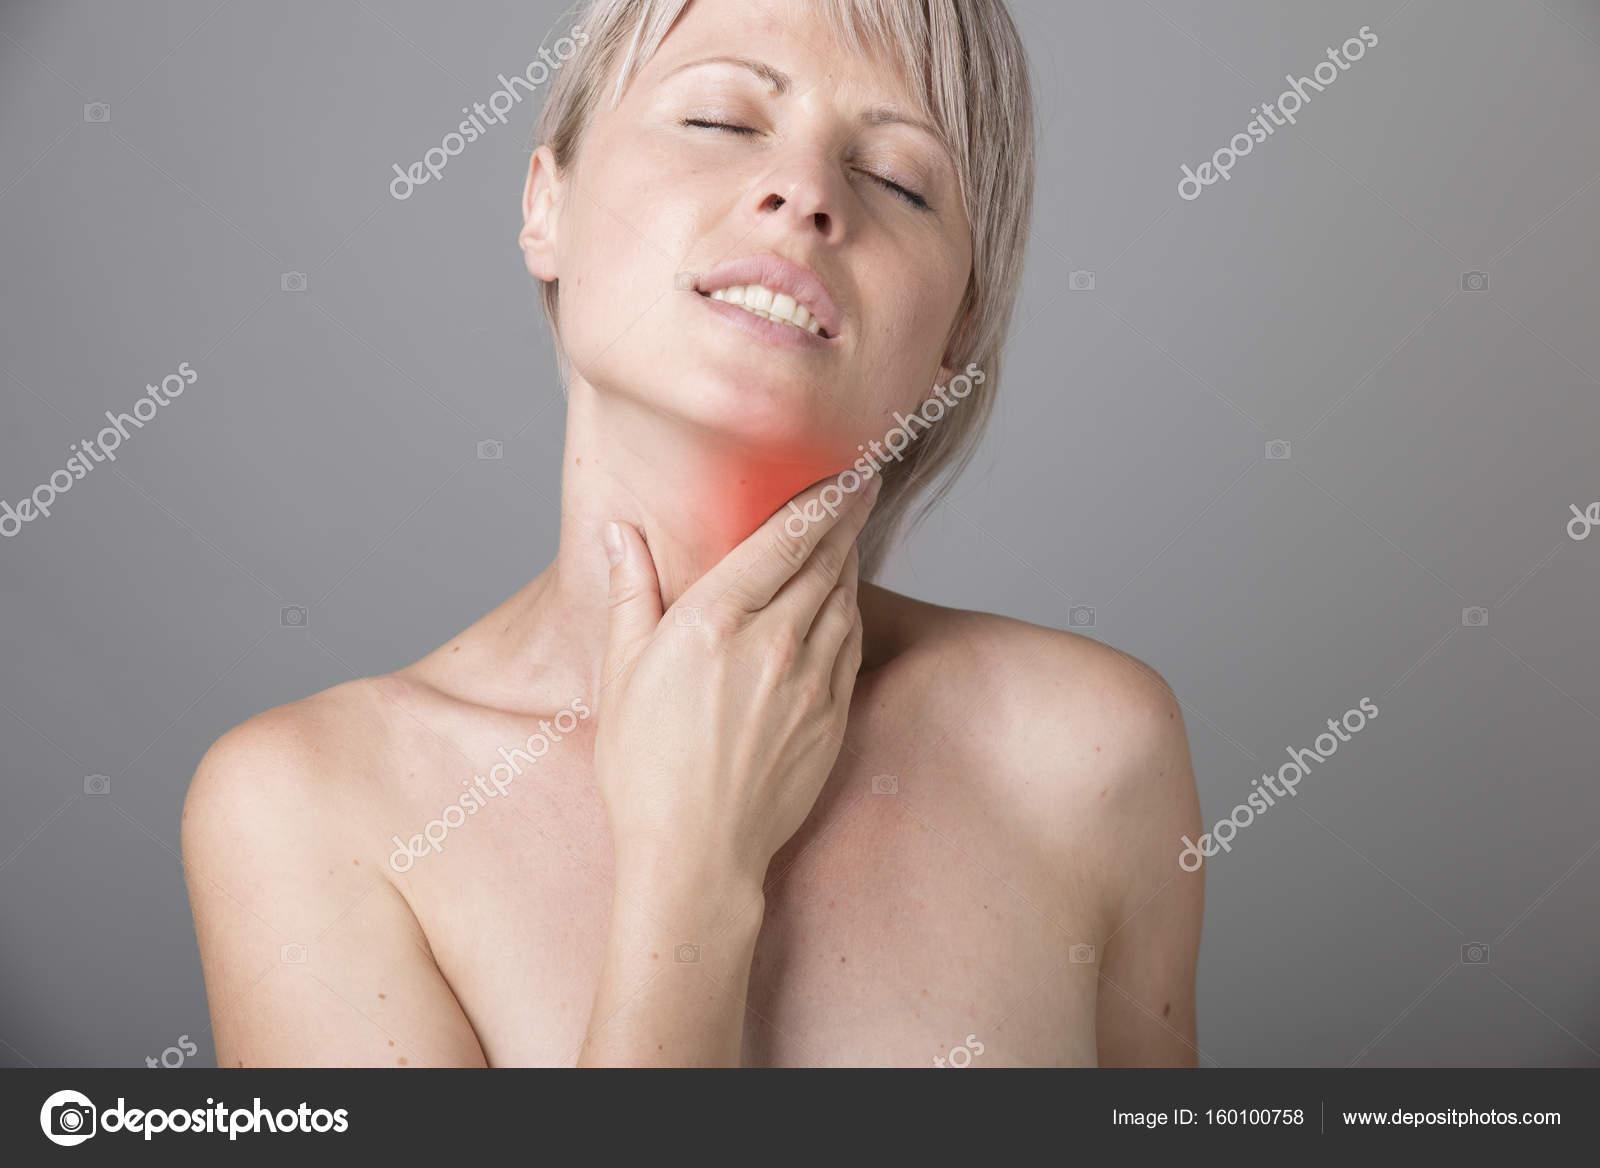 pijn in nek en keel